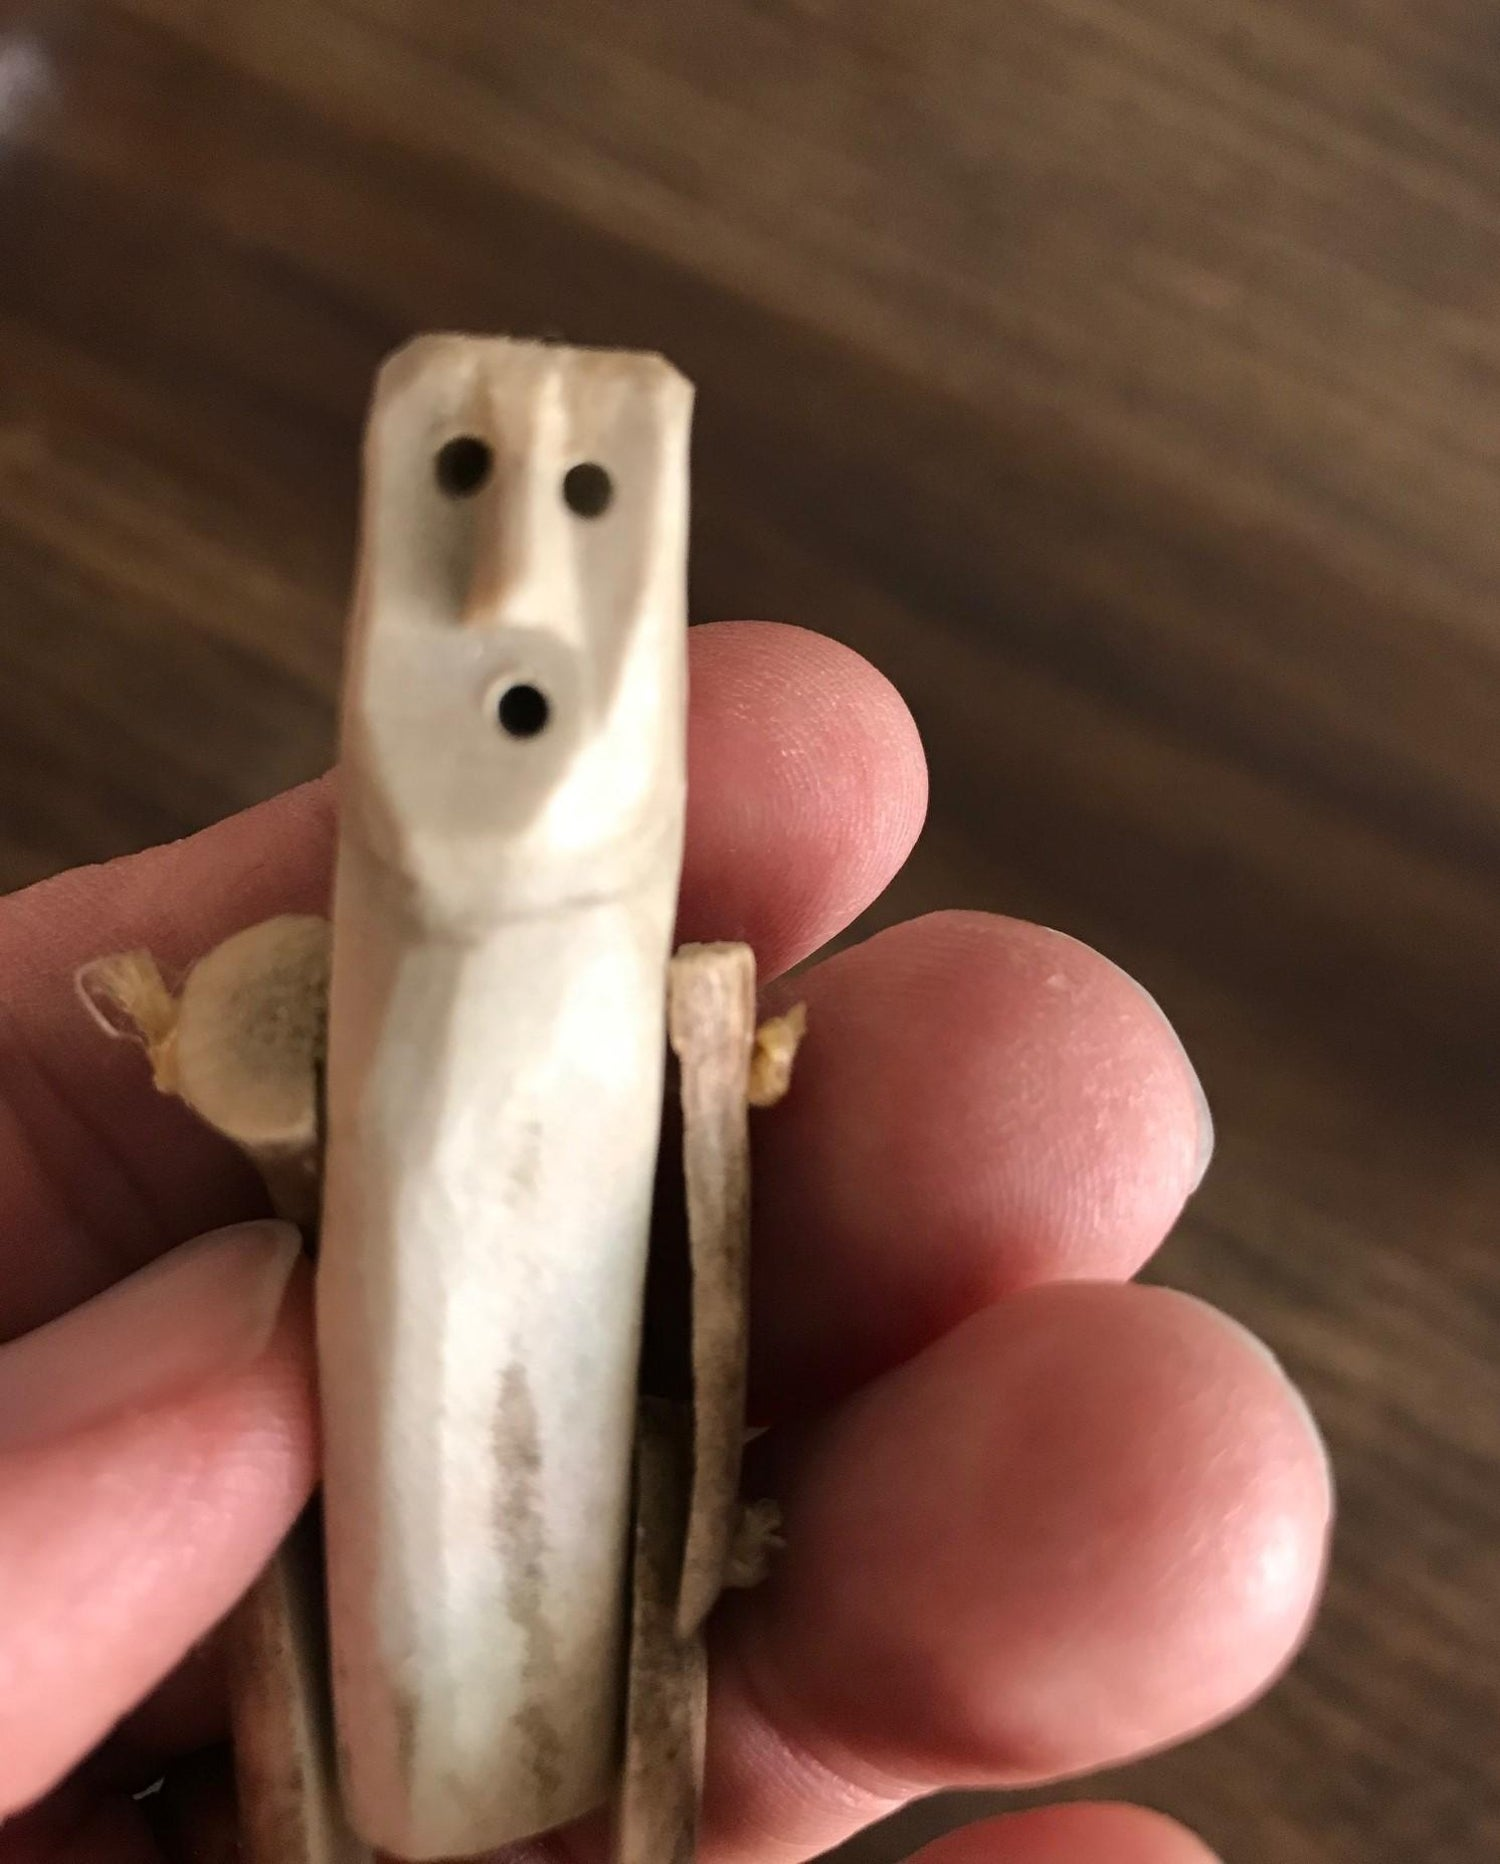 Inuit Arctic Region Folk Art Bone Hand Carved Doll Puppet Child S Toy At 1stdibs